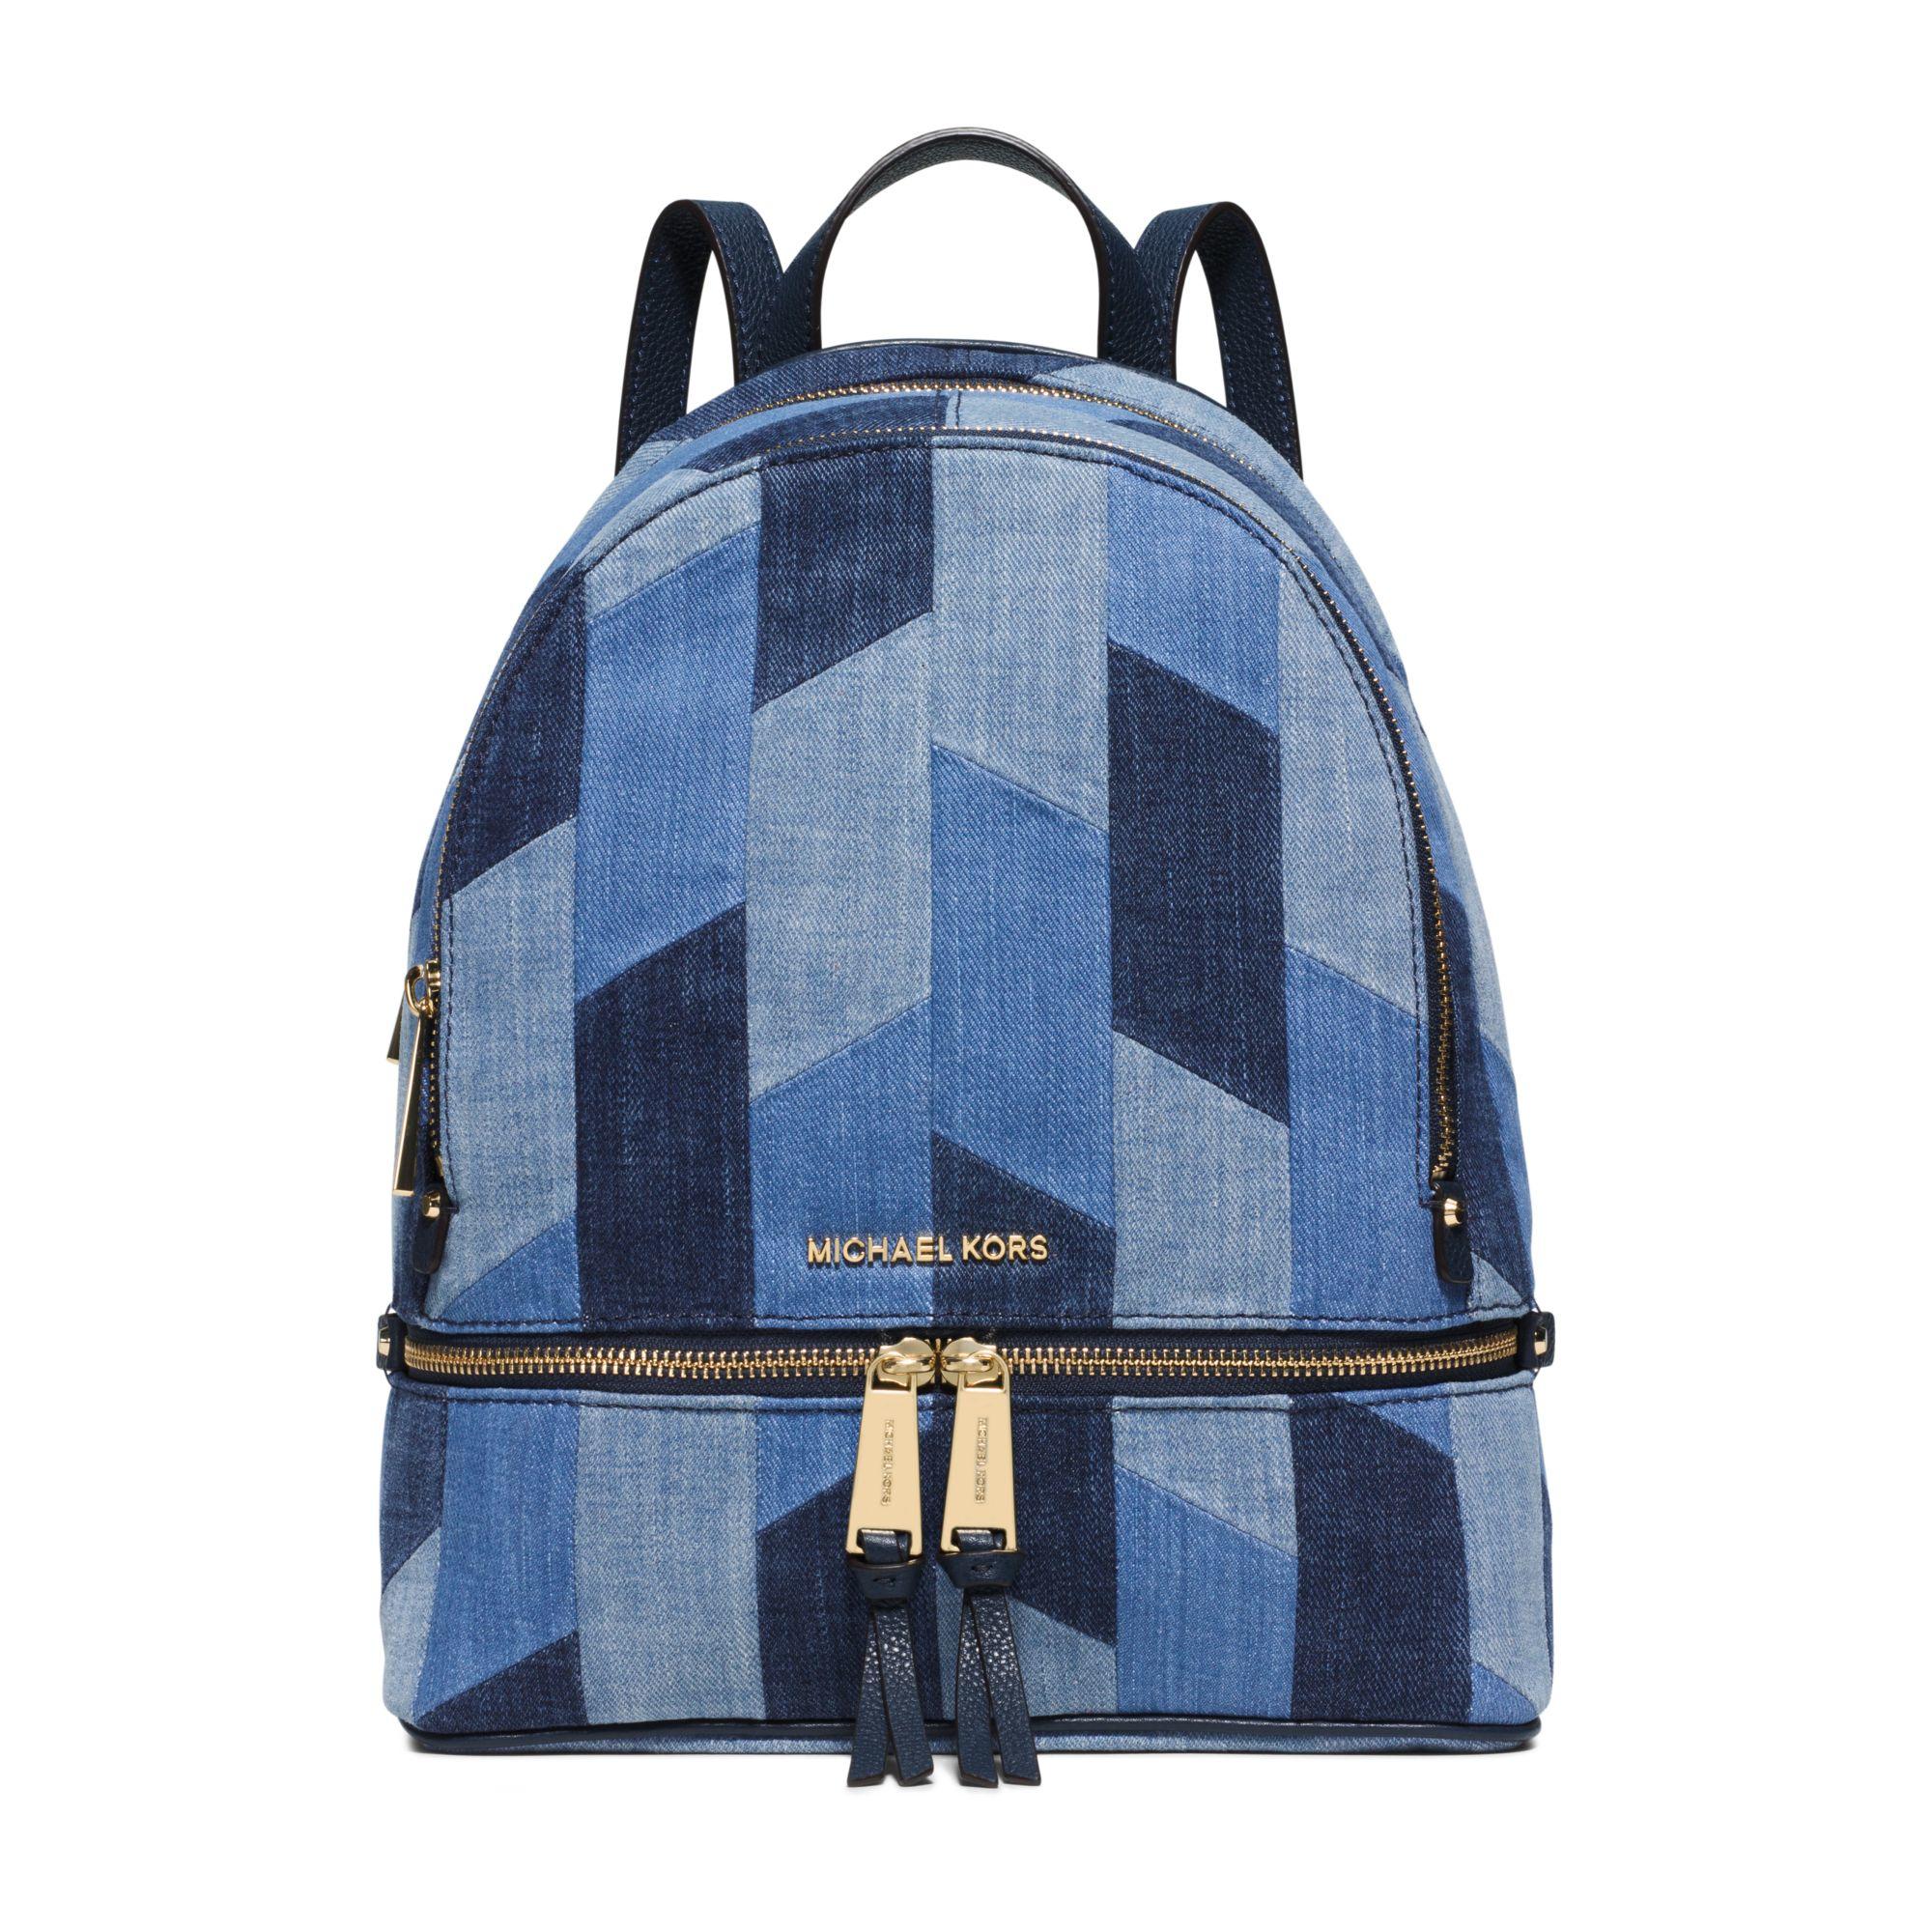 c79f2fa3559aa8 Michael Kors Rhea Medium Mosaic Patchwork Denim Backpack in Blue - Lyst